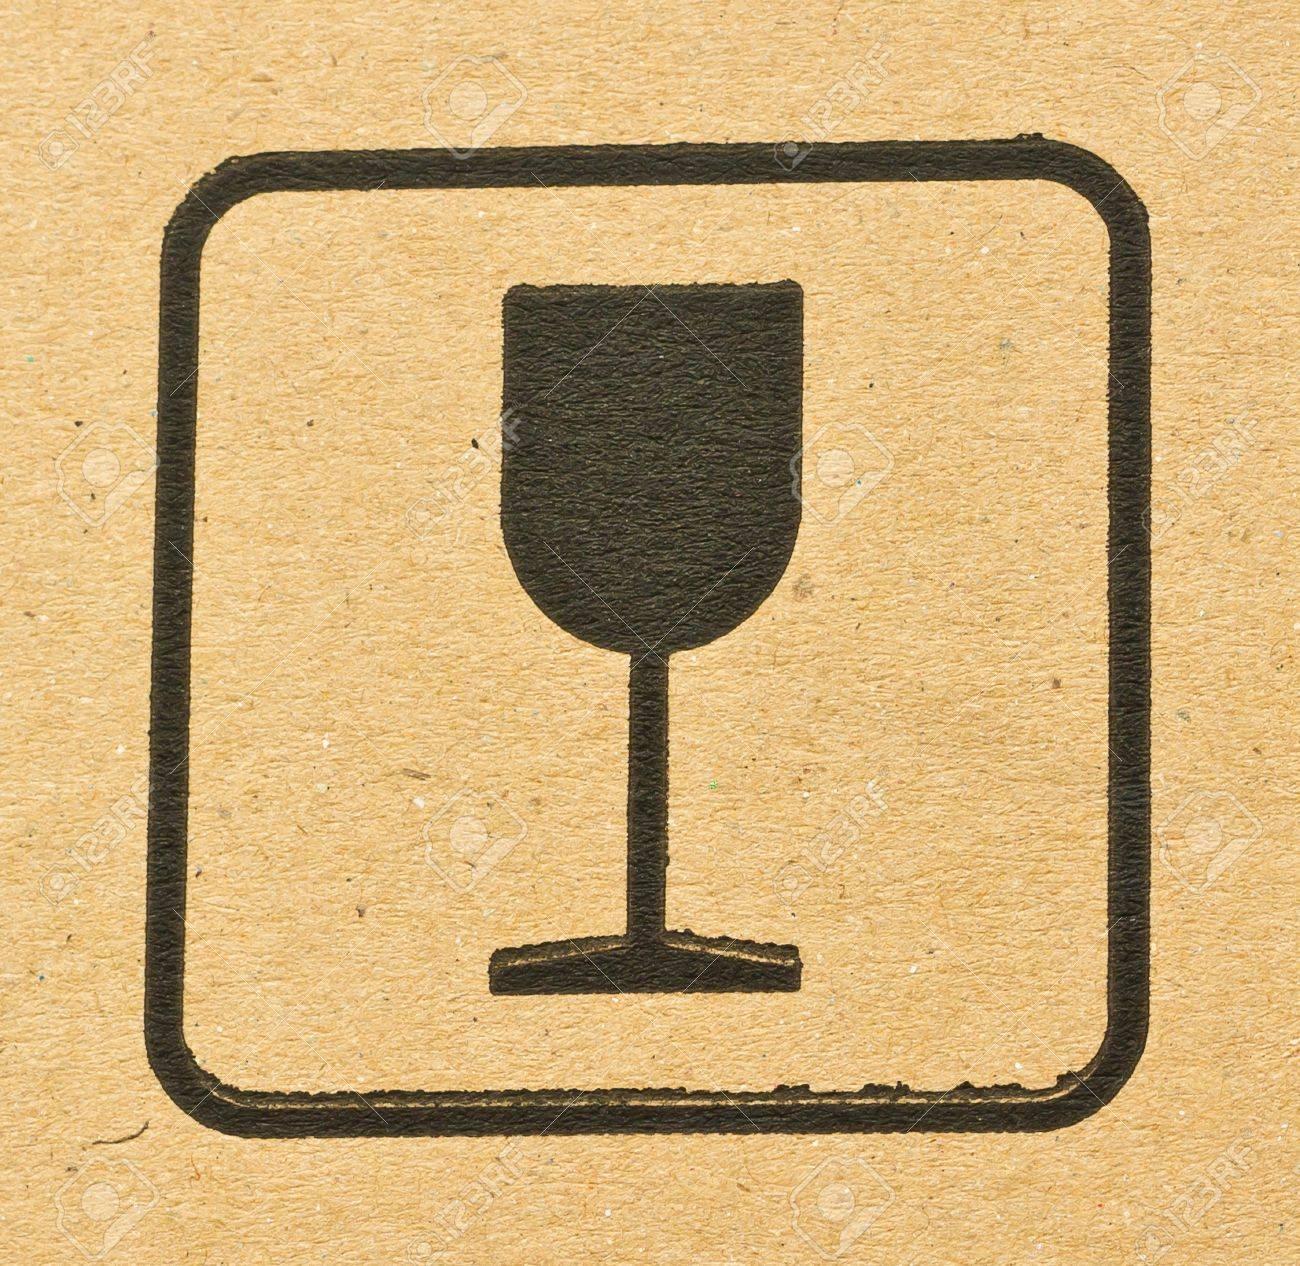 Black fragile symbol on cardboard Stock Photo - 18960399